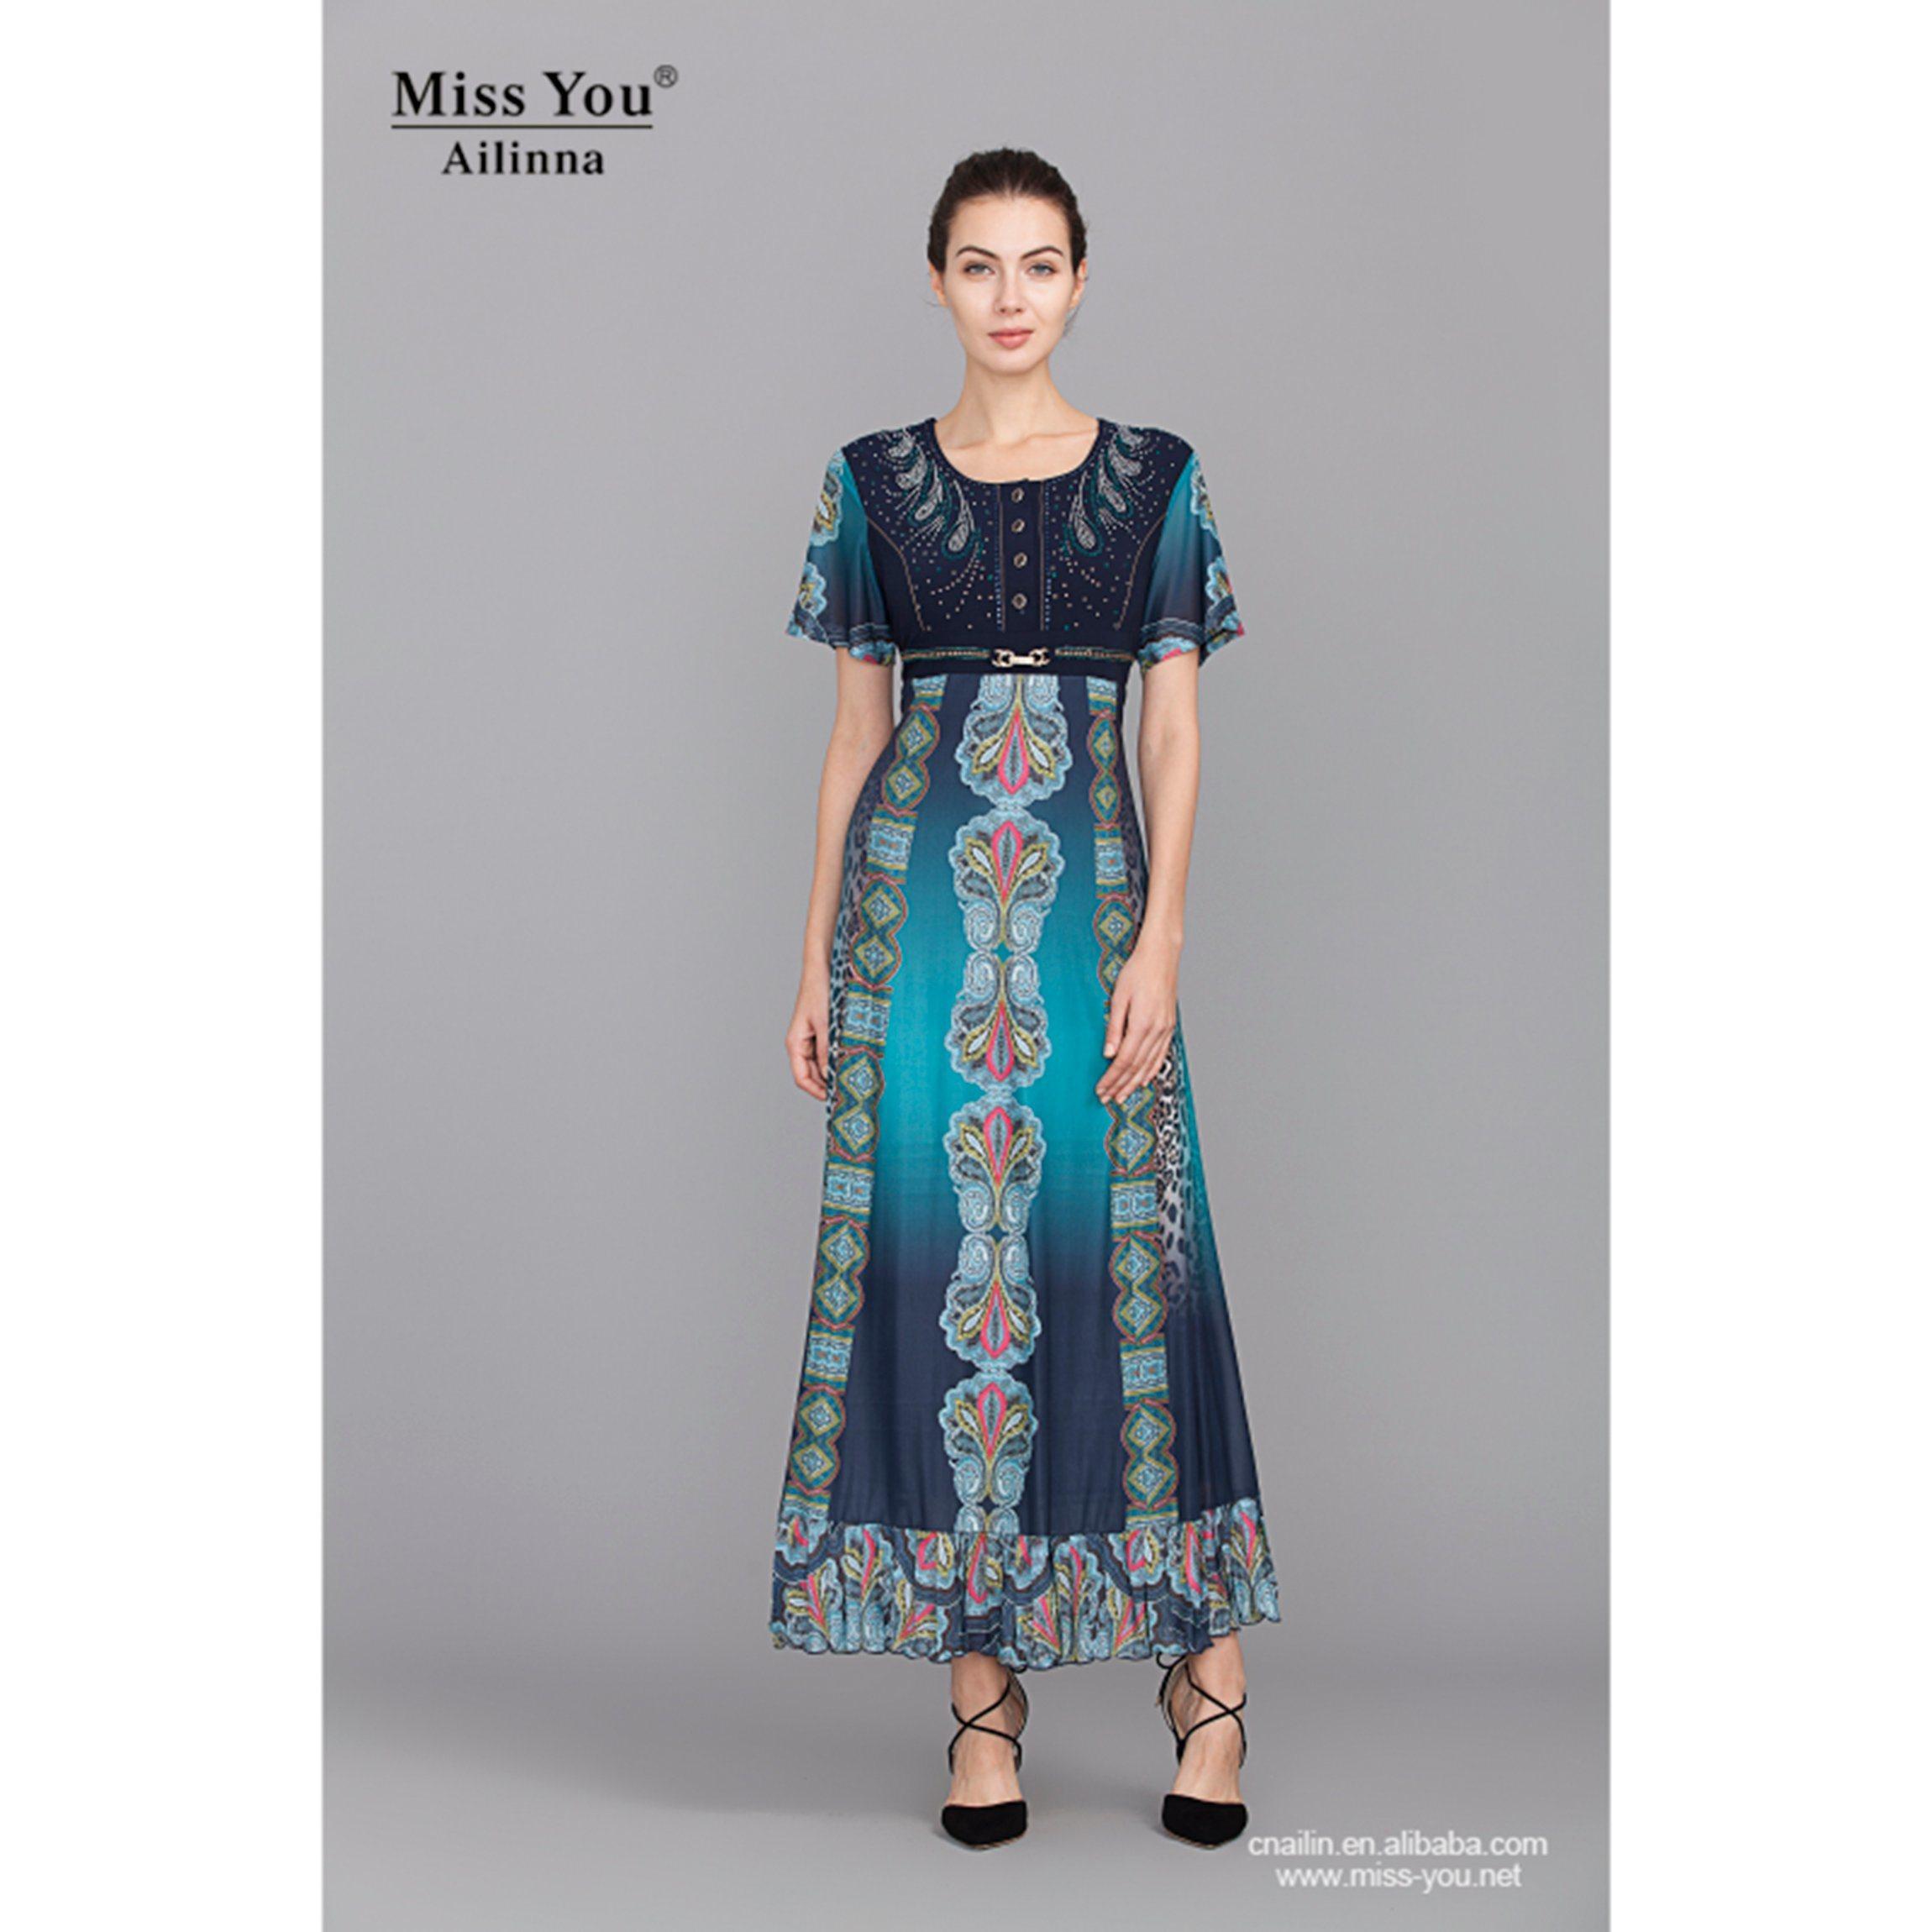 Miss You Ailinna 101972 Slim Long Dress Elegant Dress with High Quality